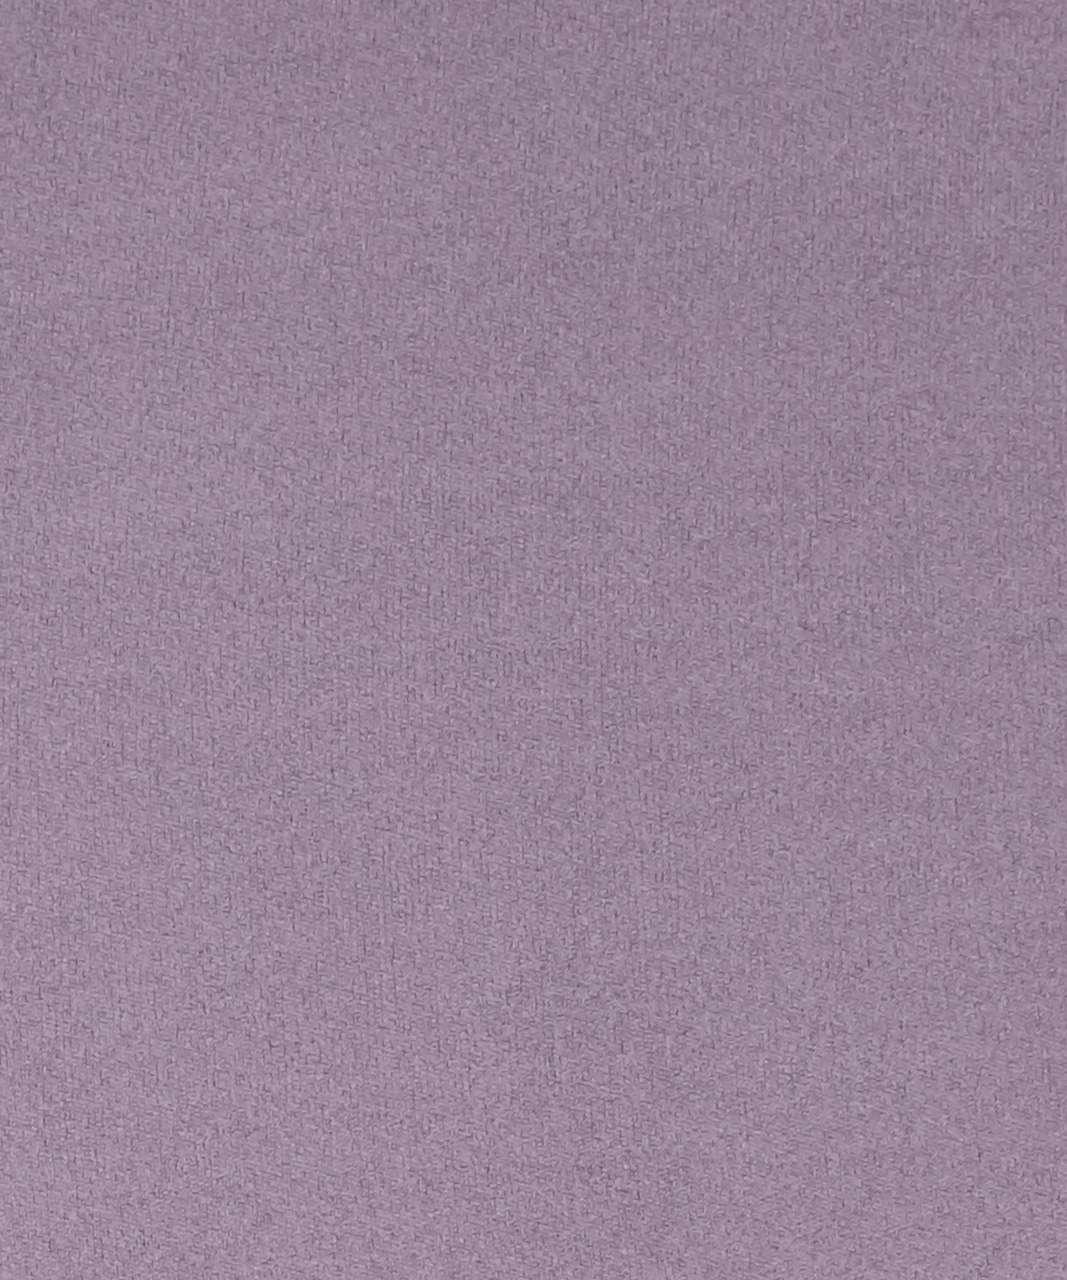 "Lululemon Align Crop *21"" - Graphite Purple"